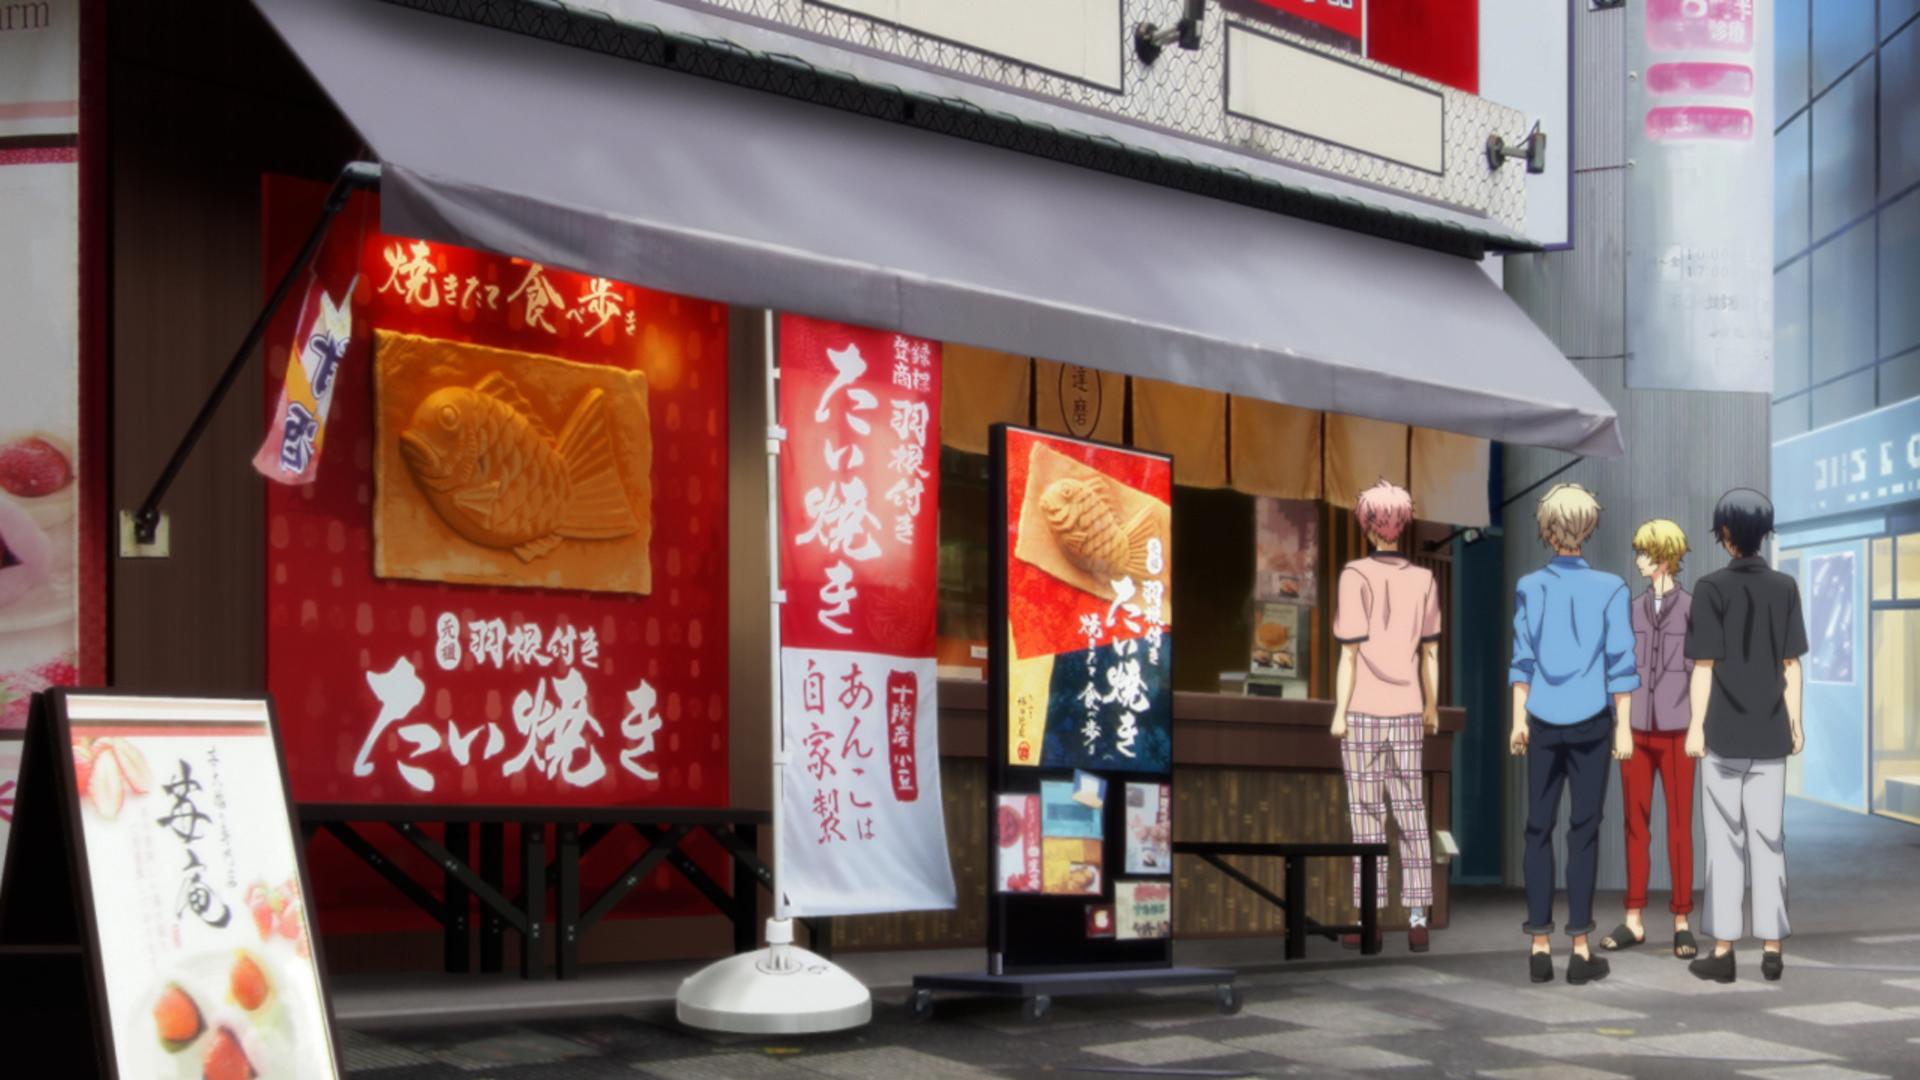 TVアニメ「ツキアニ。2」第12話にておつな寿司・たいやき神田達磨・ホテルグランドパレスとコラボレーション!